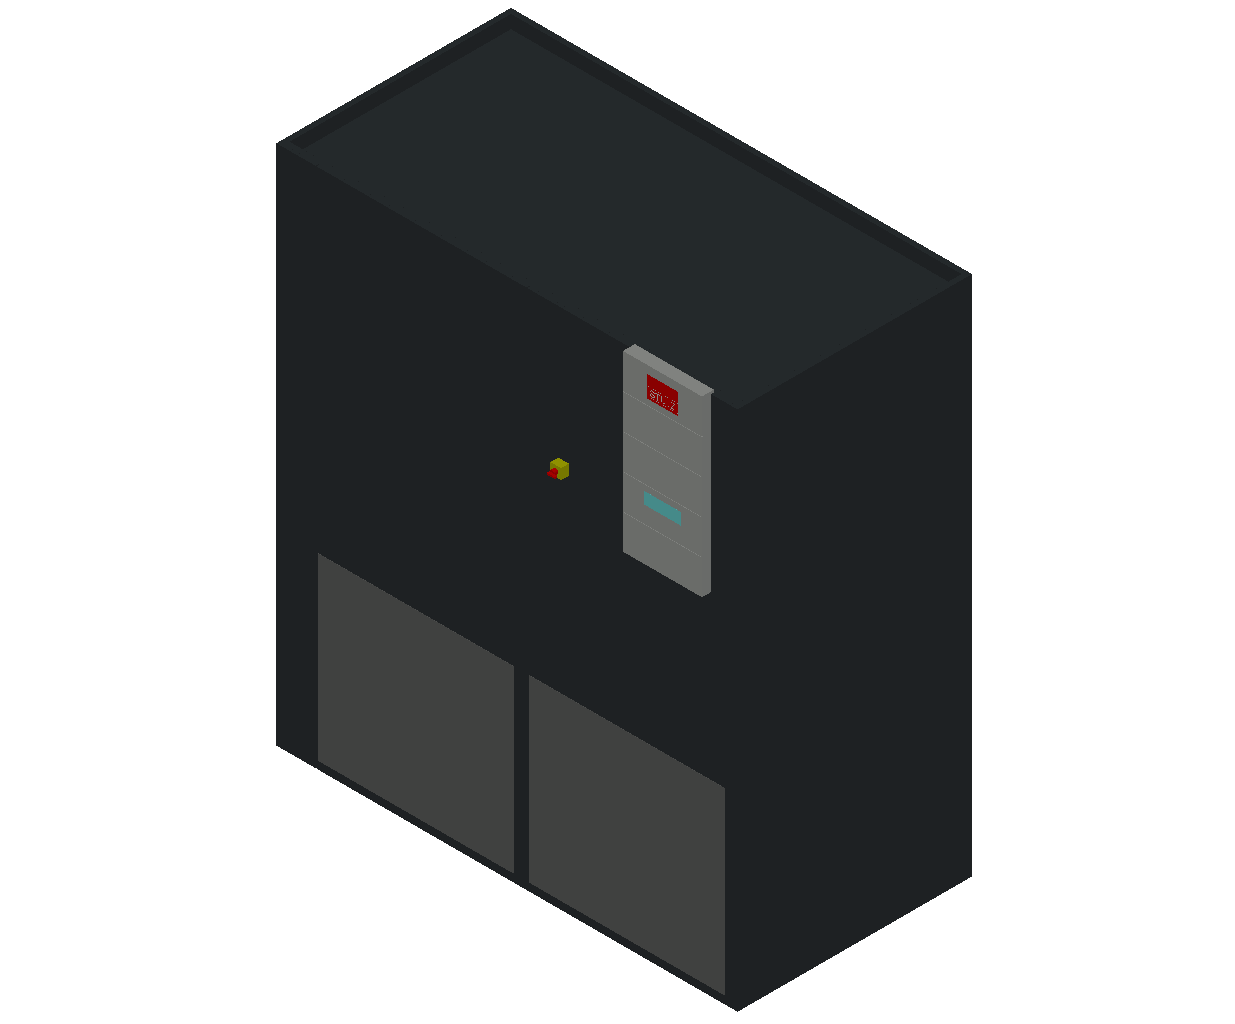 HC_Air Conditioner_Indoor Unit_MEPcontent_STULZ_CyberAir 3PRO_ASU_Single Circuit AS_ASU_501_AS_INT-EN.dwg